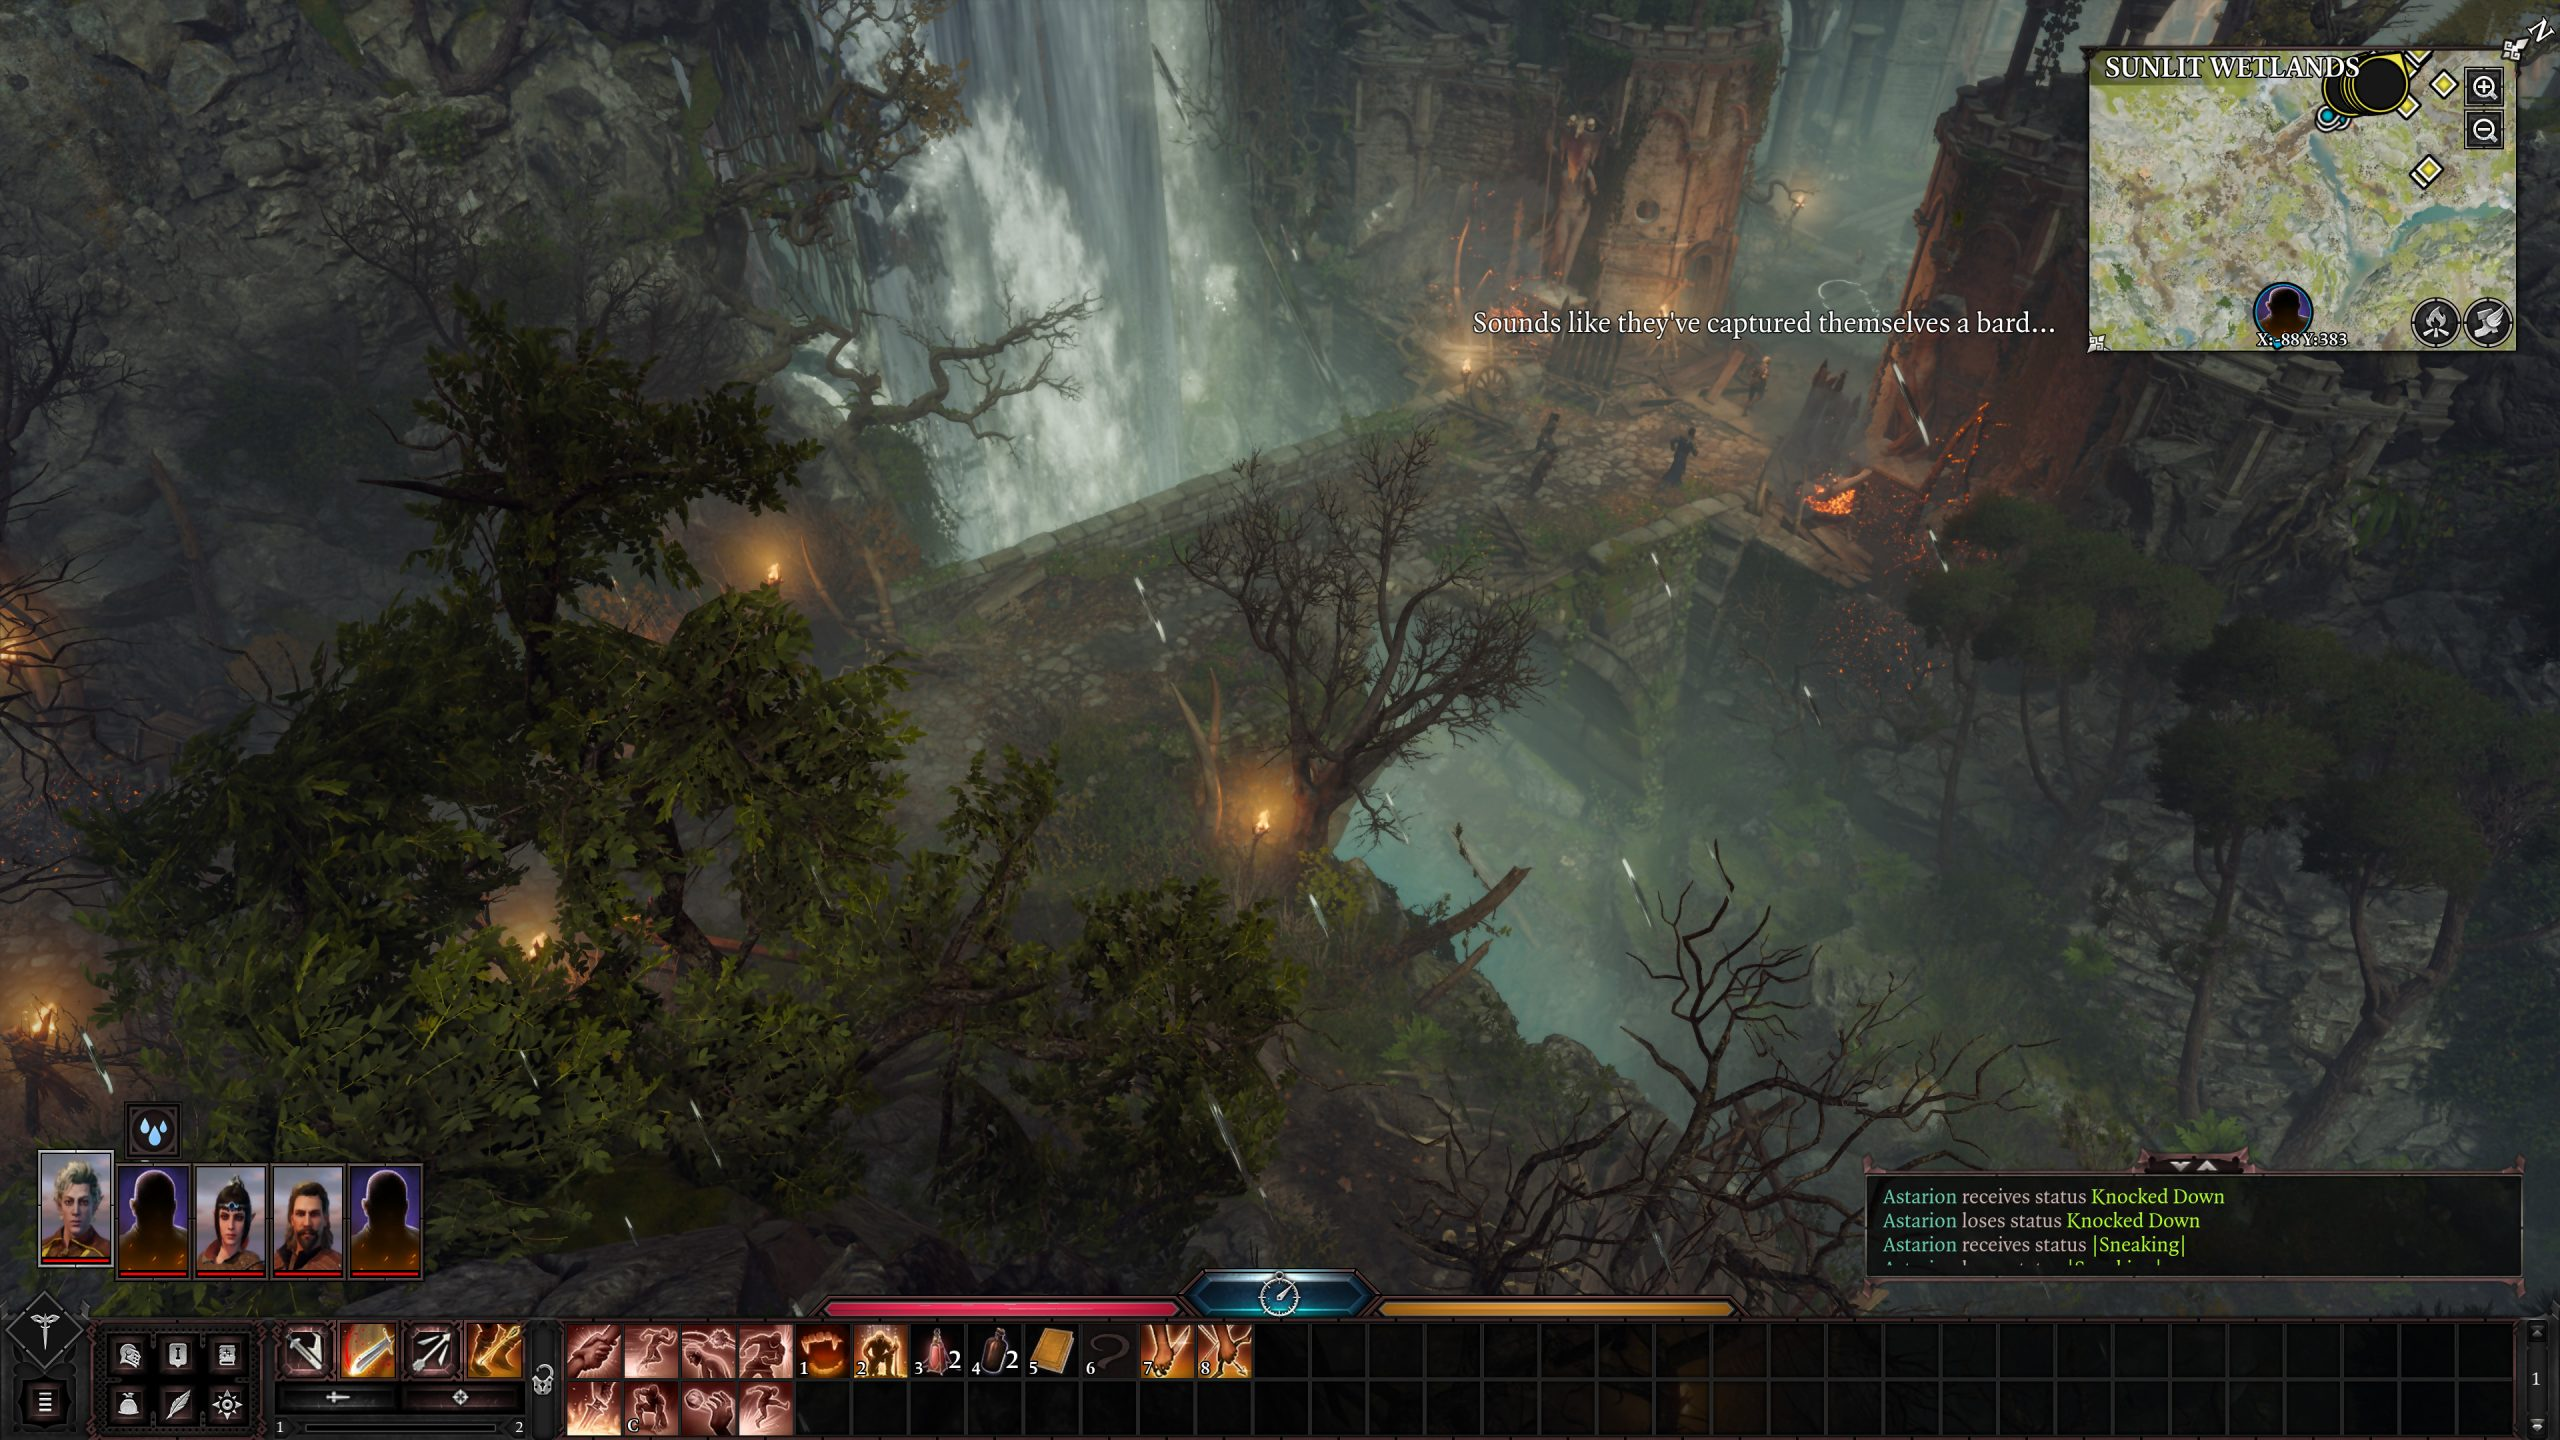 Утечка: скриншоты Baldur's Gate III 4